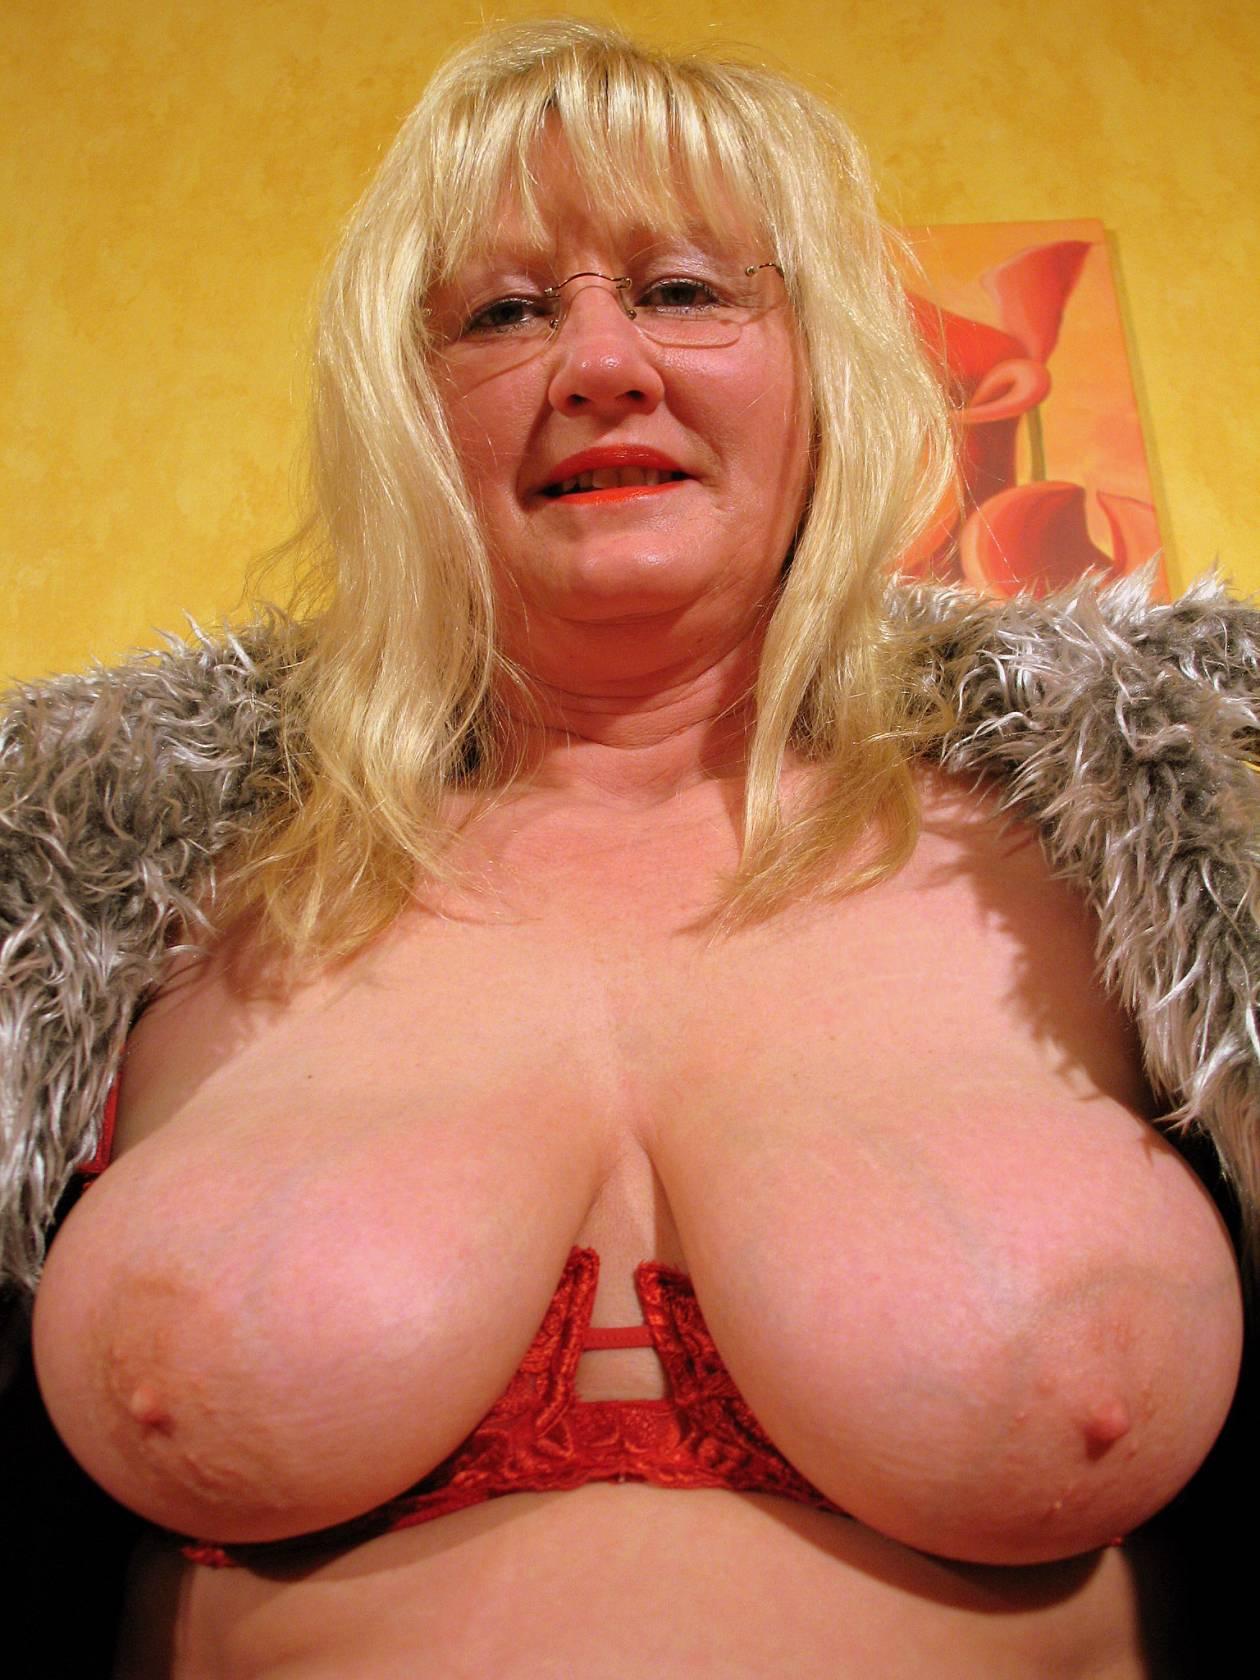 boy-andrea-german-mature-housewife